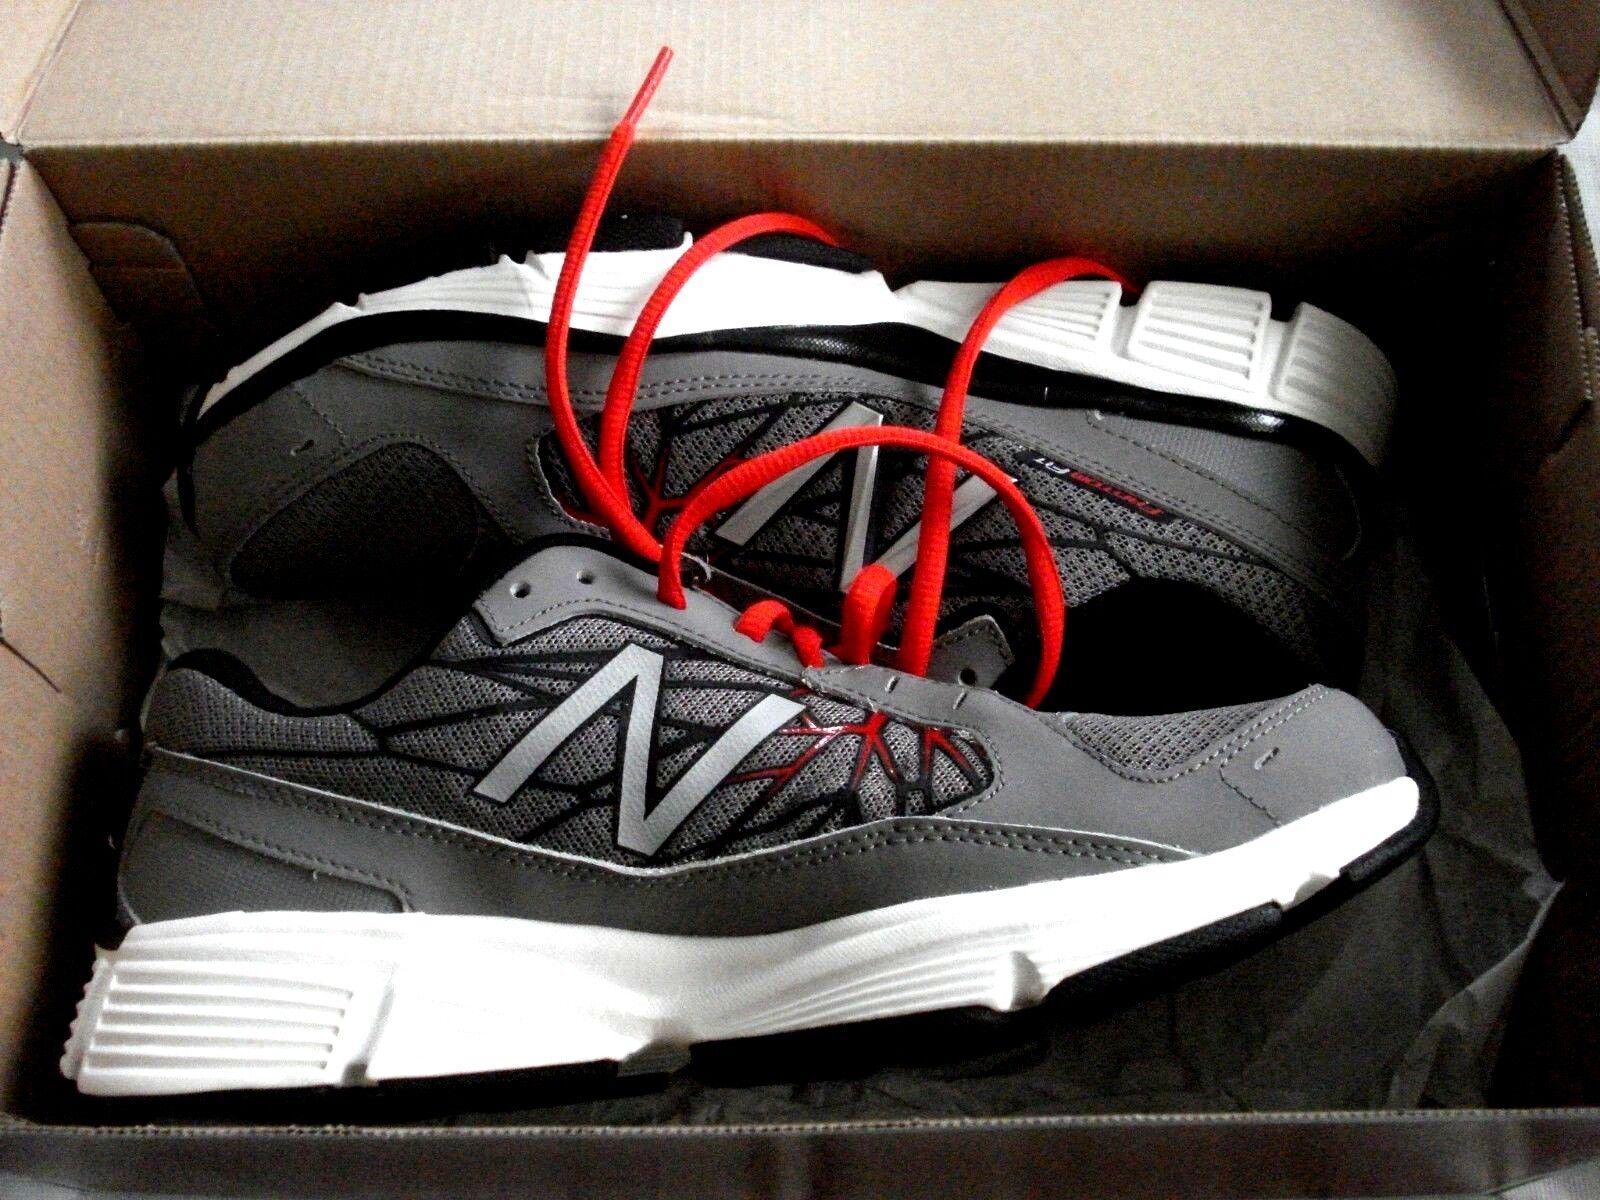 Zapatos Tenis Para Hombre New Balance gris  2 Med Duel Comfort